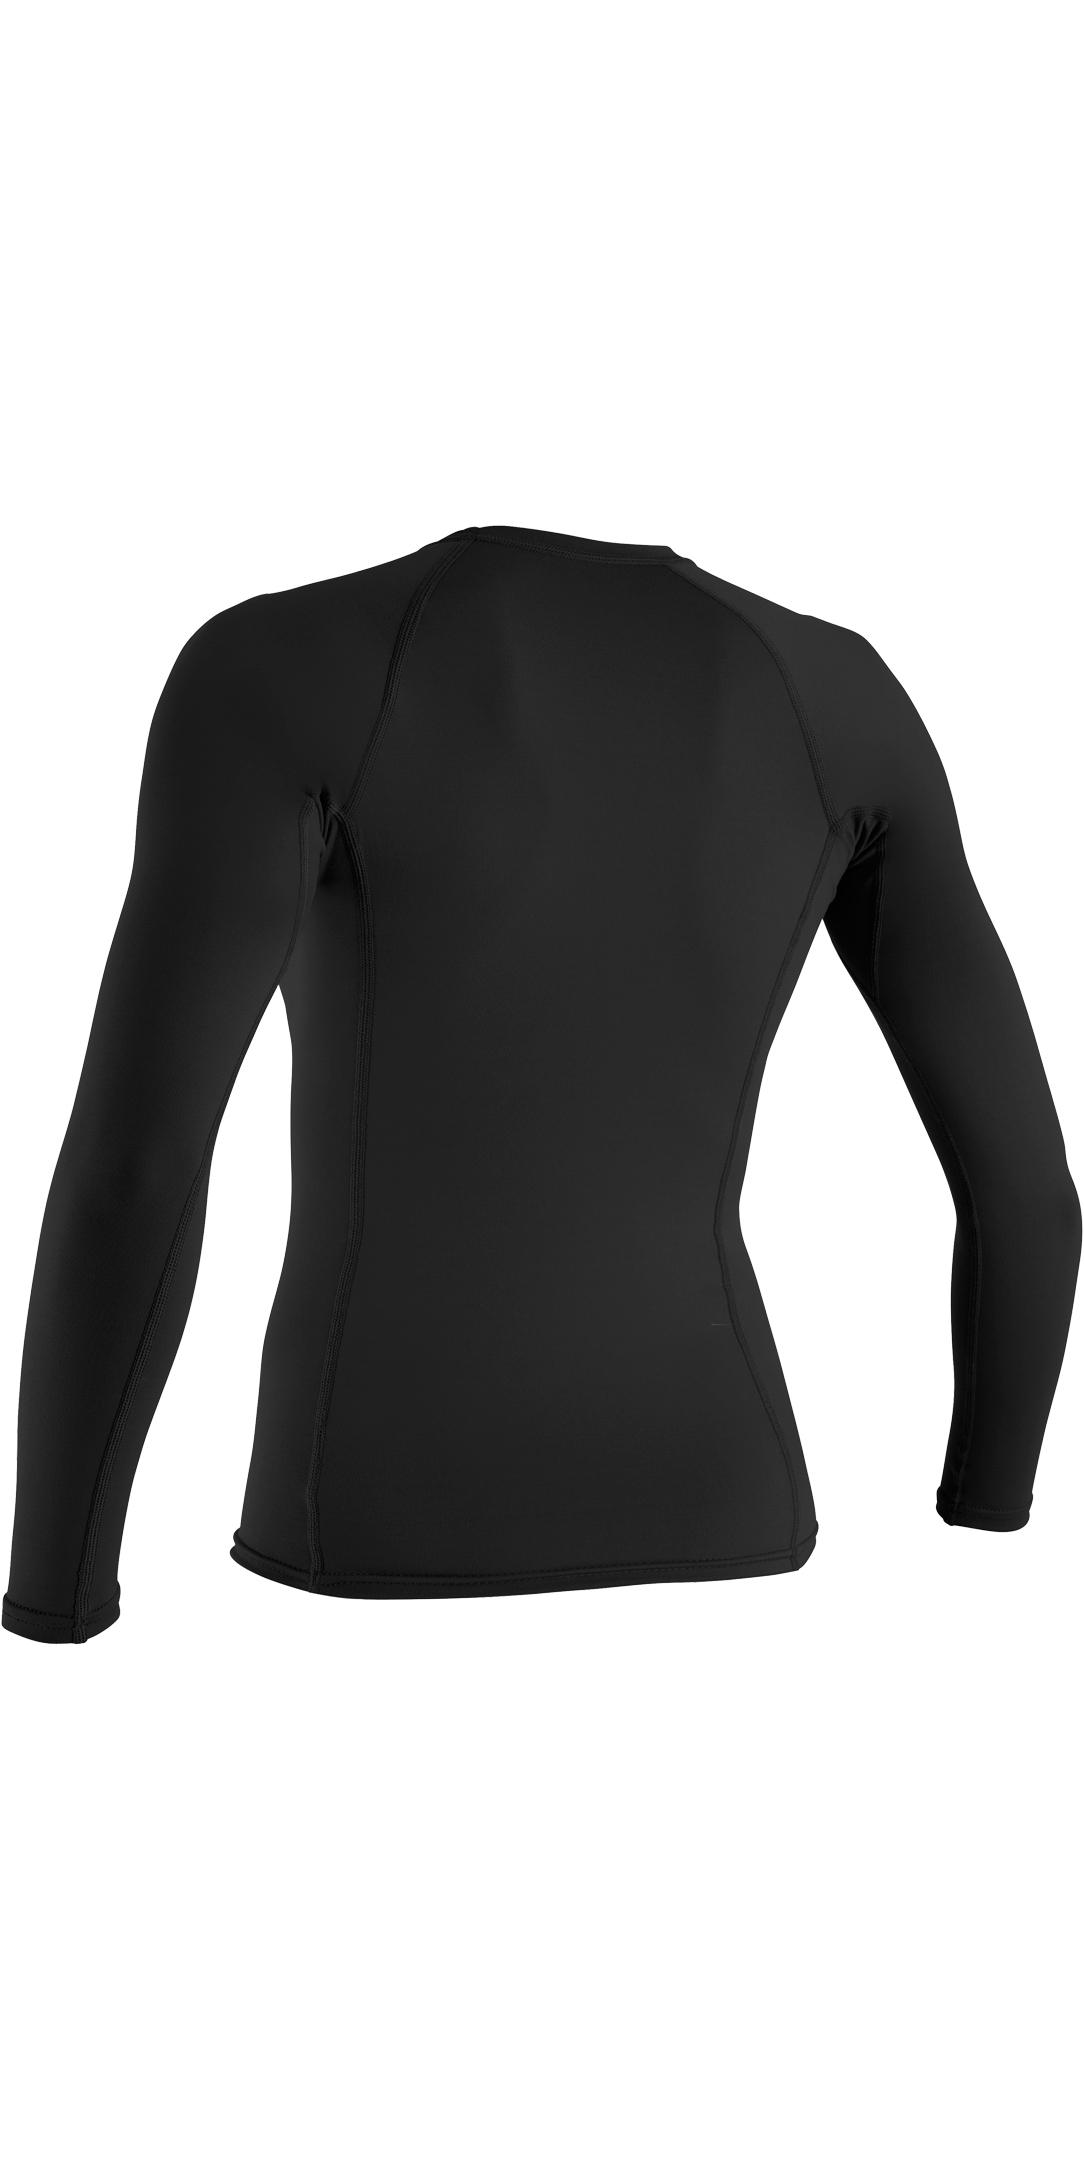 2019 Oneill Womens Basic Skins Long Sleeve Crew Rash Vest Black 3549 ... ac2ce815d